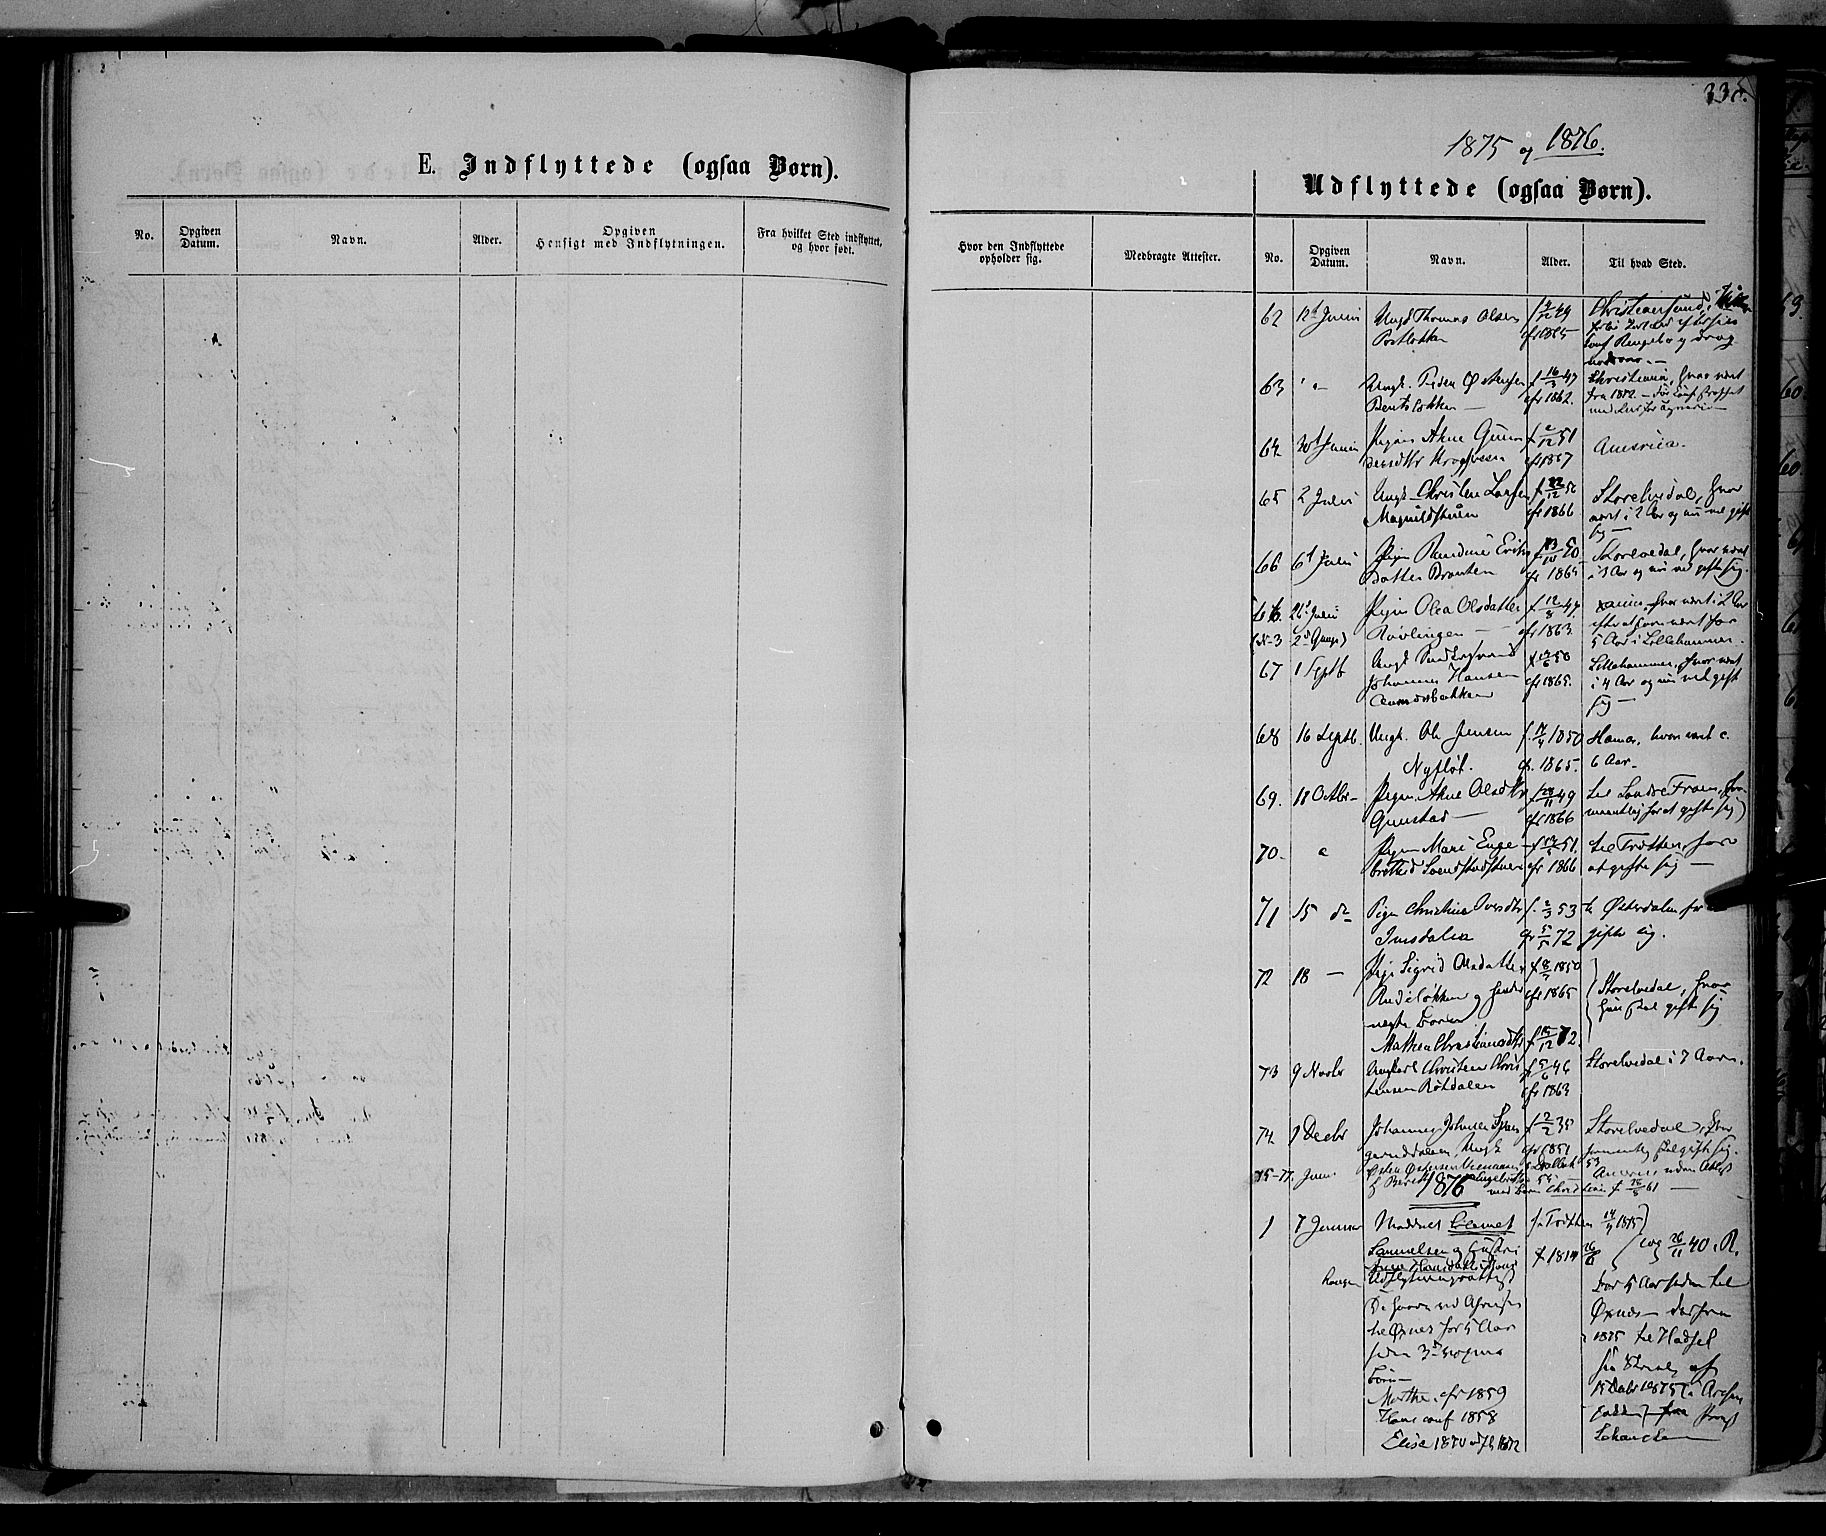 SAH, Ringebu prestekontor, Ministerialbok nr. 7, 1860-1877, s. 330